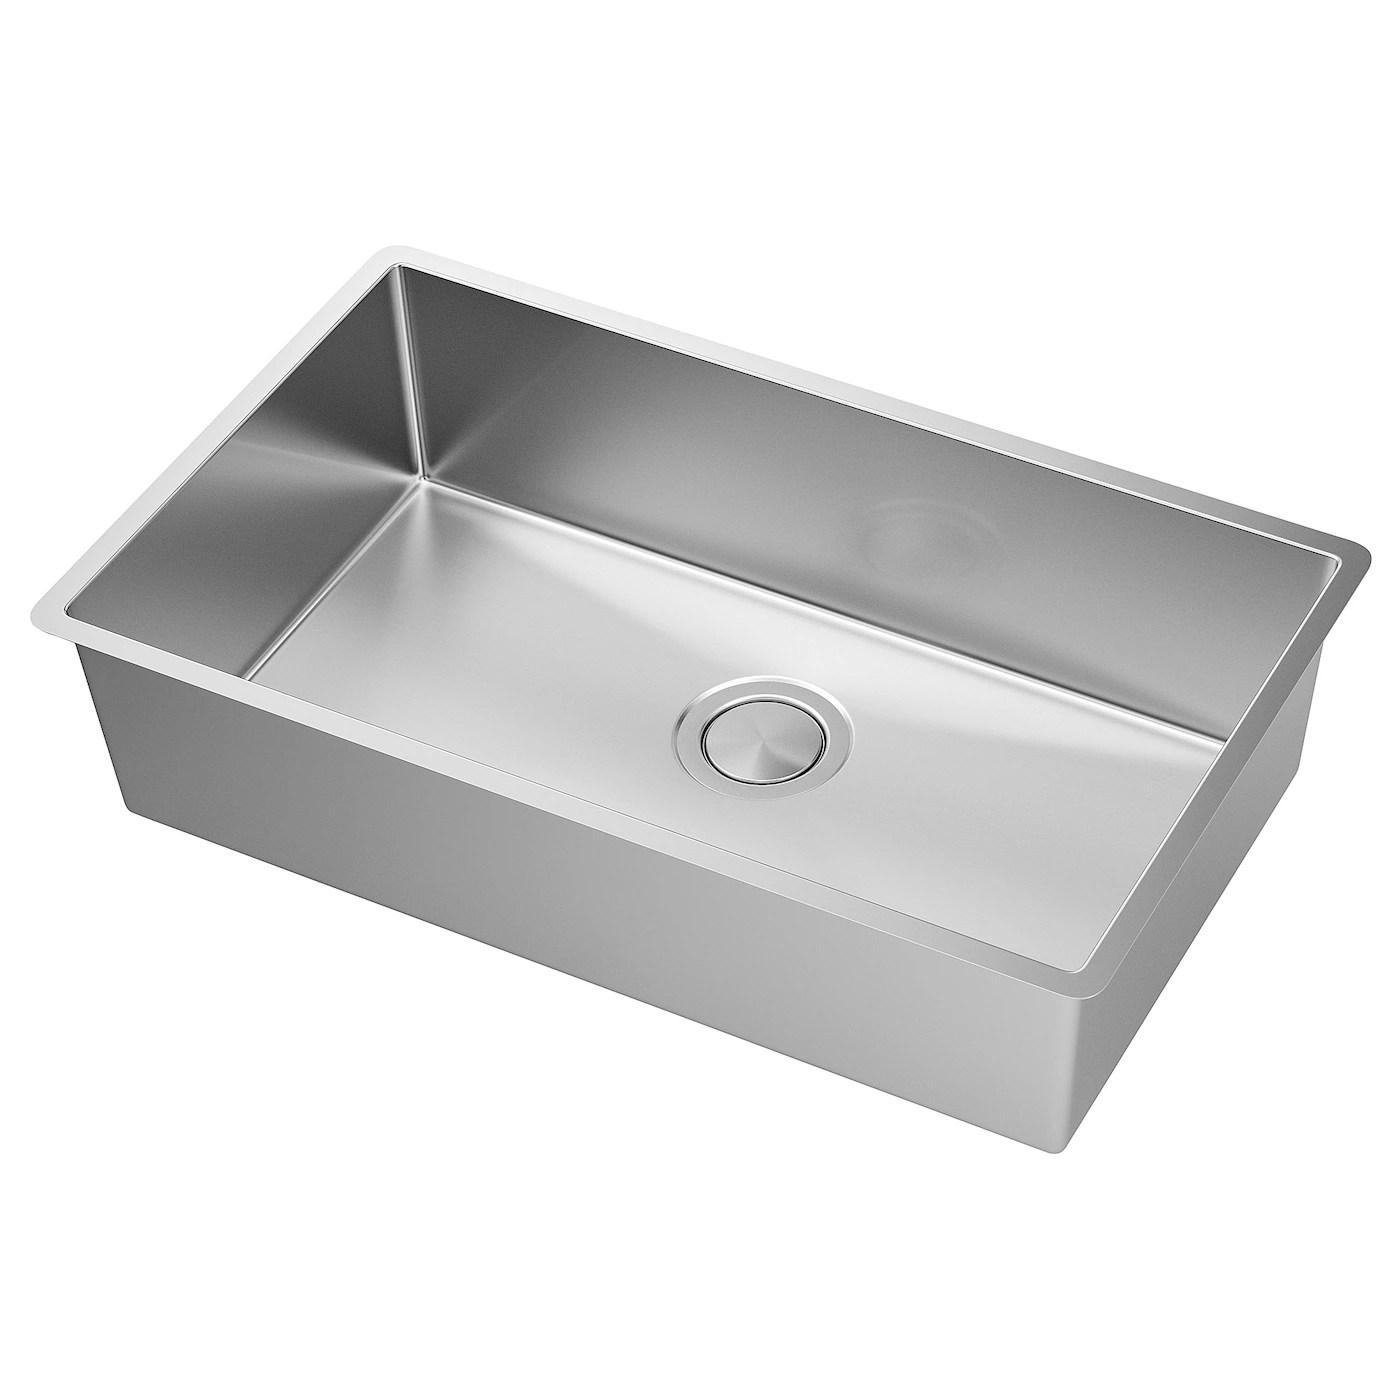 norrsjon sink stainless steel 29x17 3 8